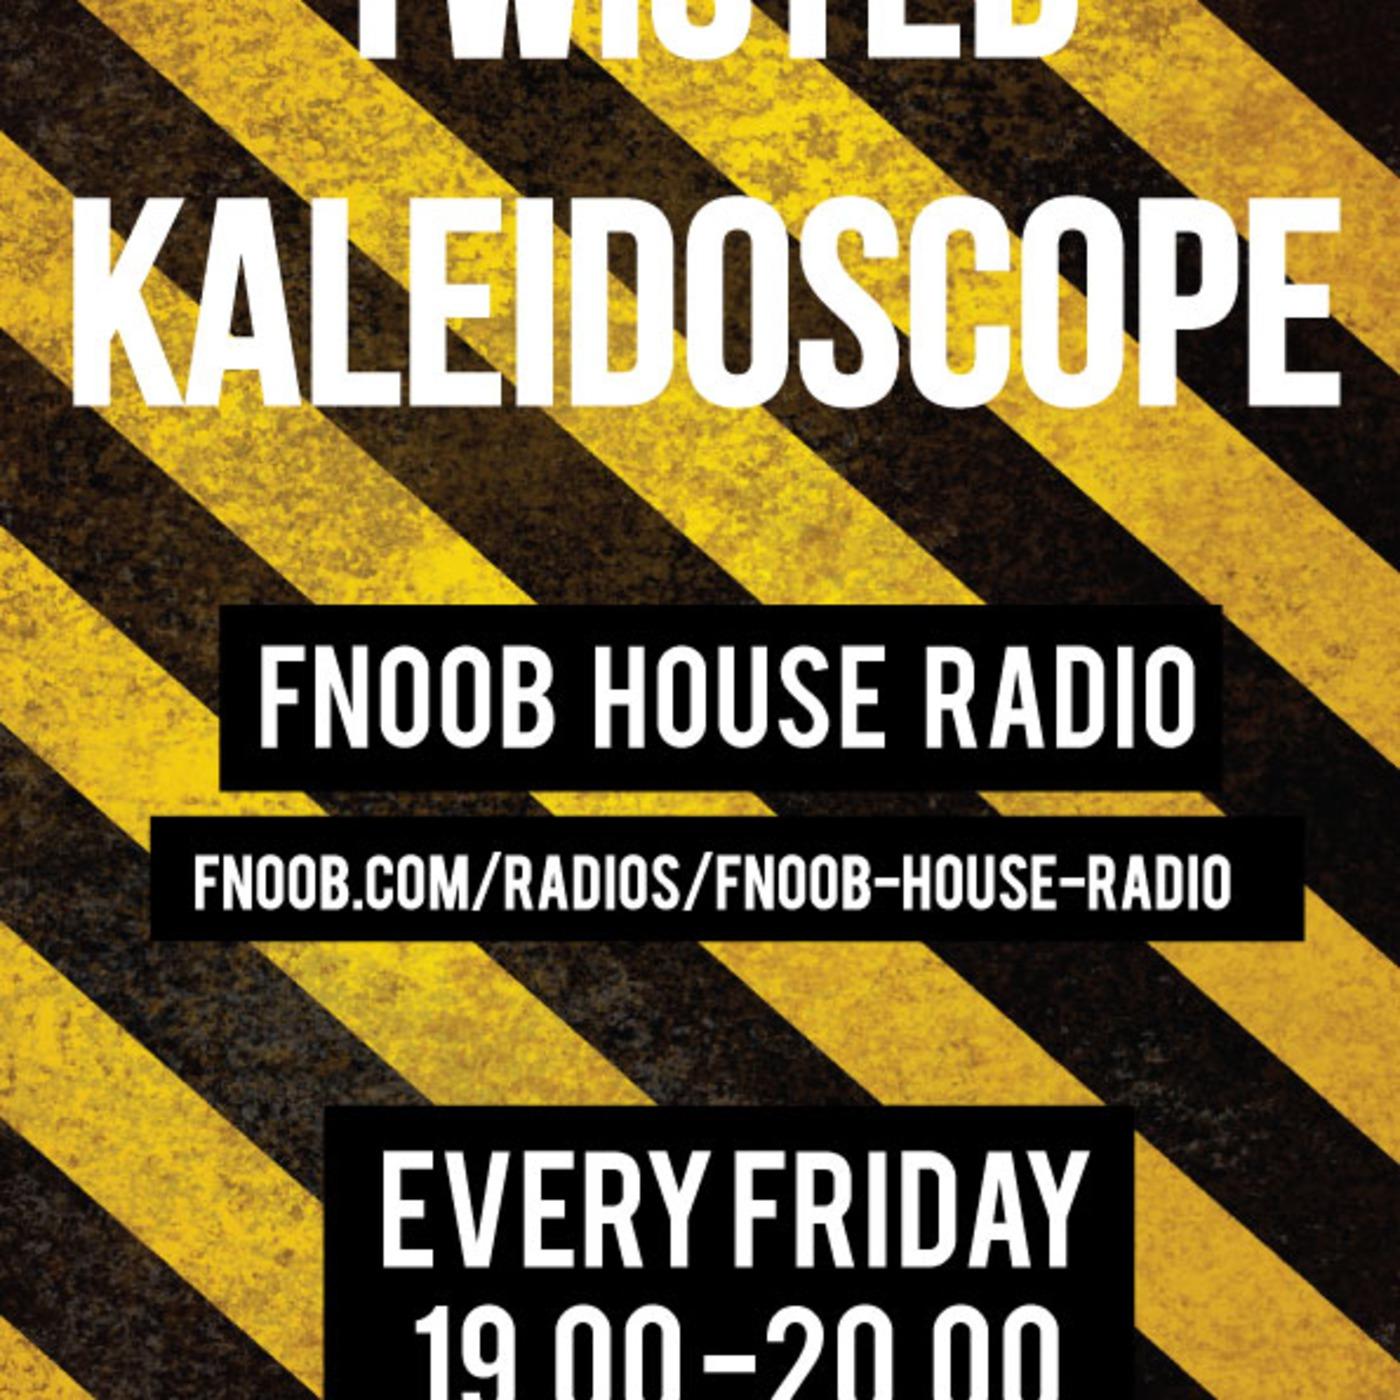 Twisted Kaleidoscope Podcast - Fnoob House Radio